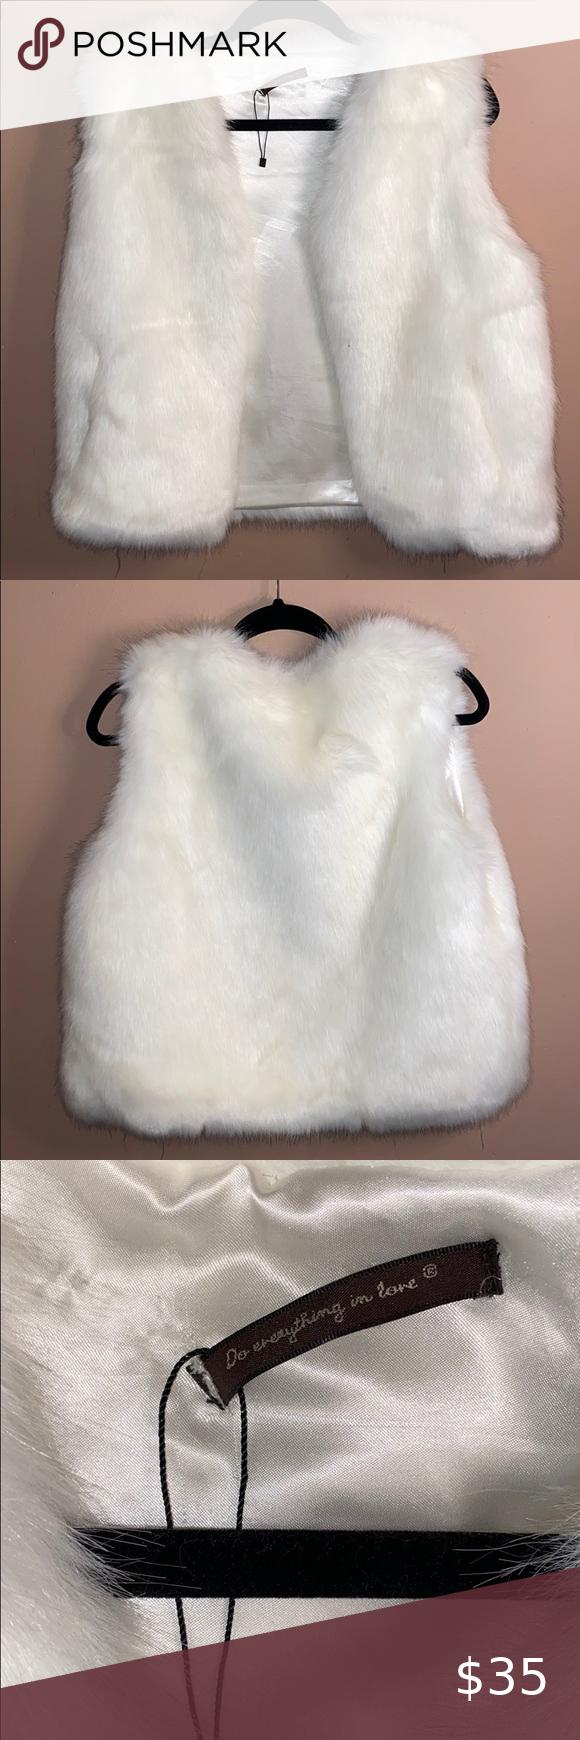 Pure White Faux Fur Vest Cyberpunk Fashion White Faux Fur Vest White Faux Fur